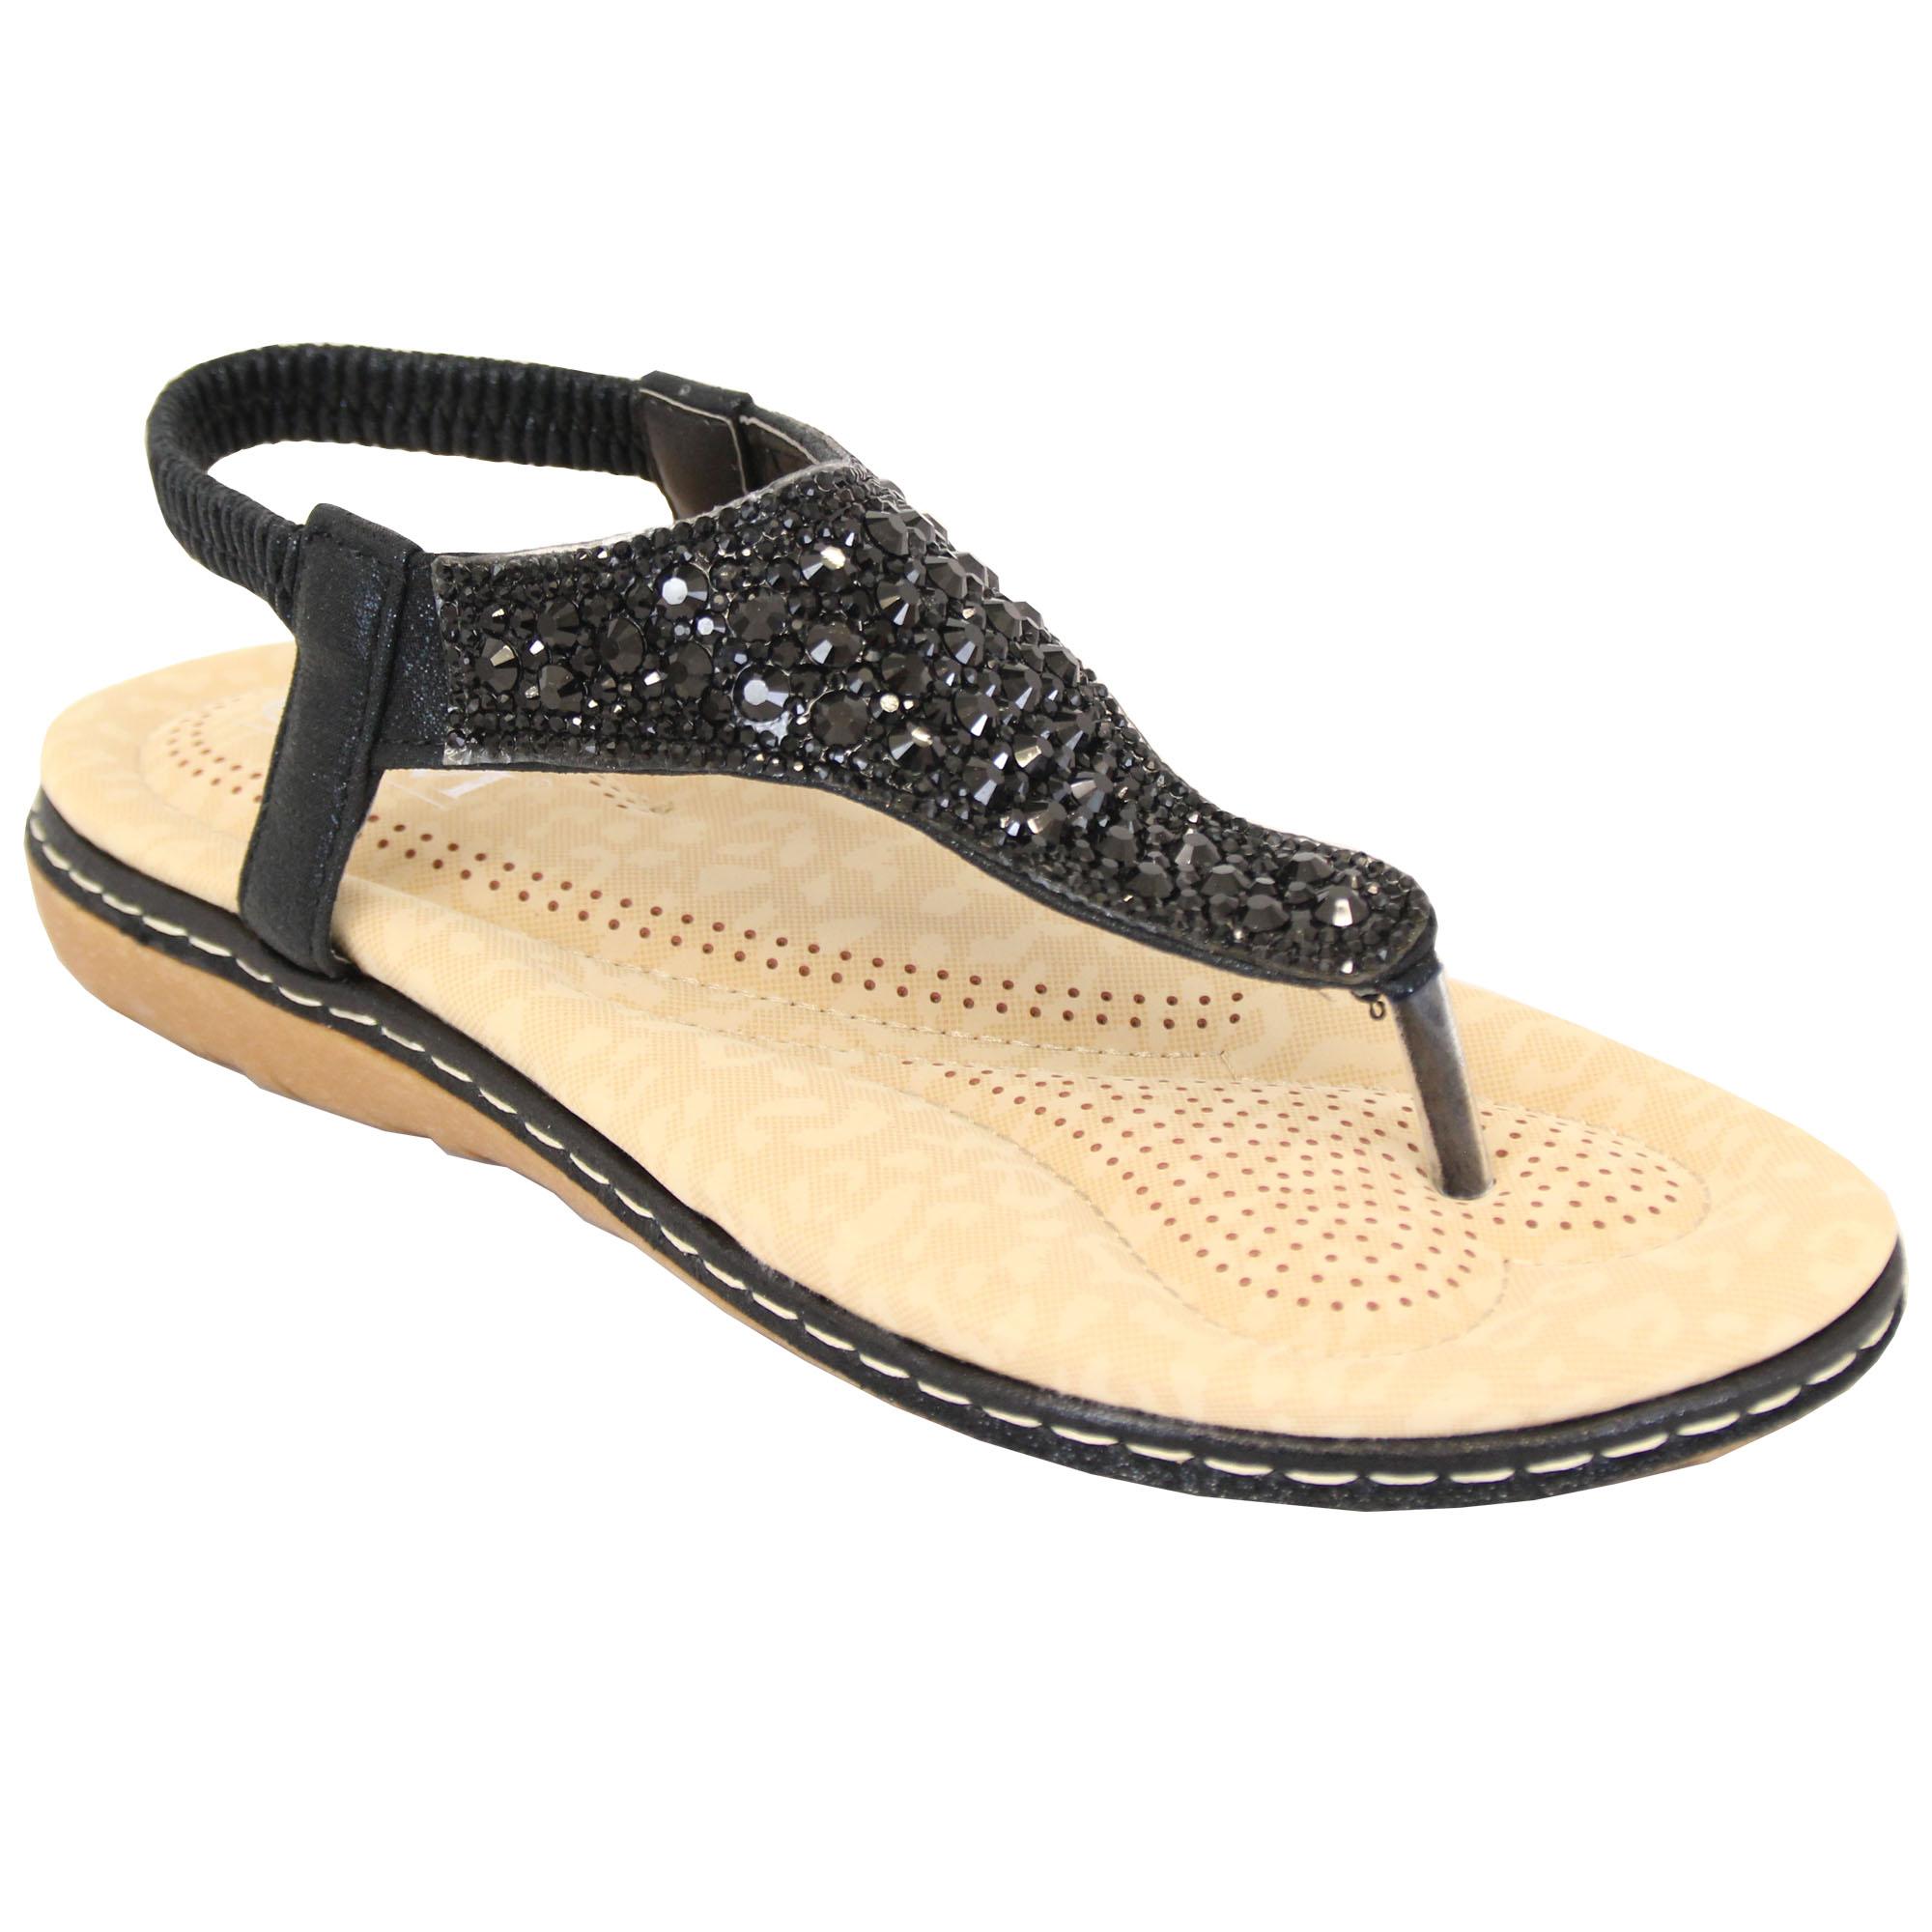 Ladies-Diamante-Sandals-Womens-Slip-On-Toe-Post-Sling-Back-Shoes-Wedding-Party thumbnail 2